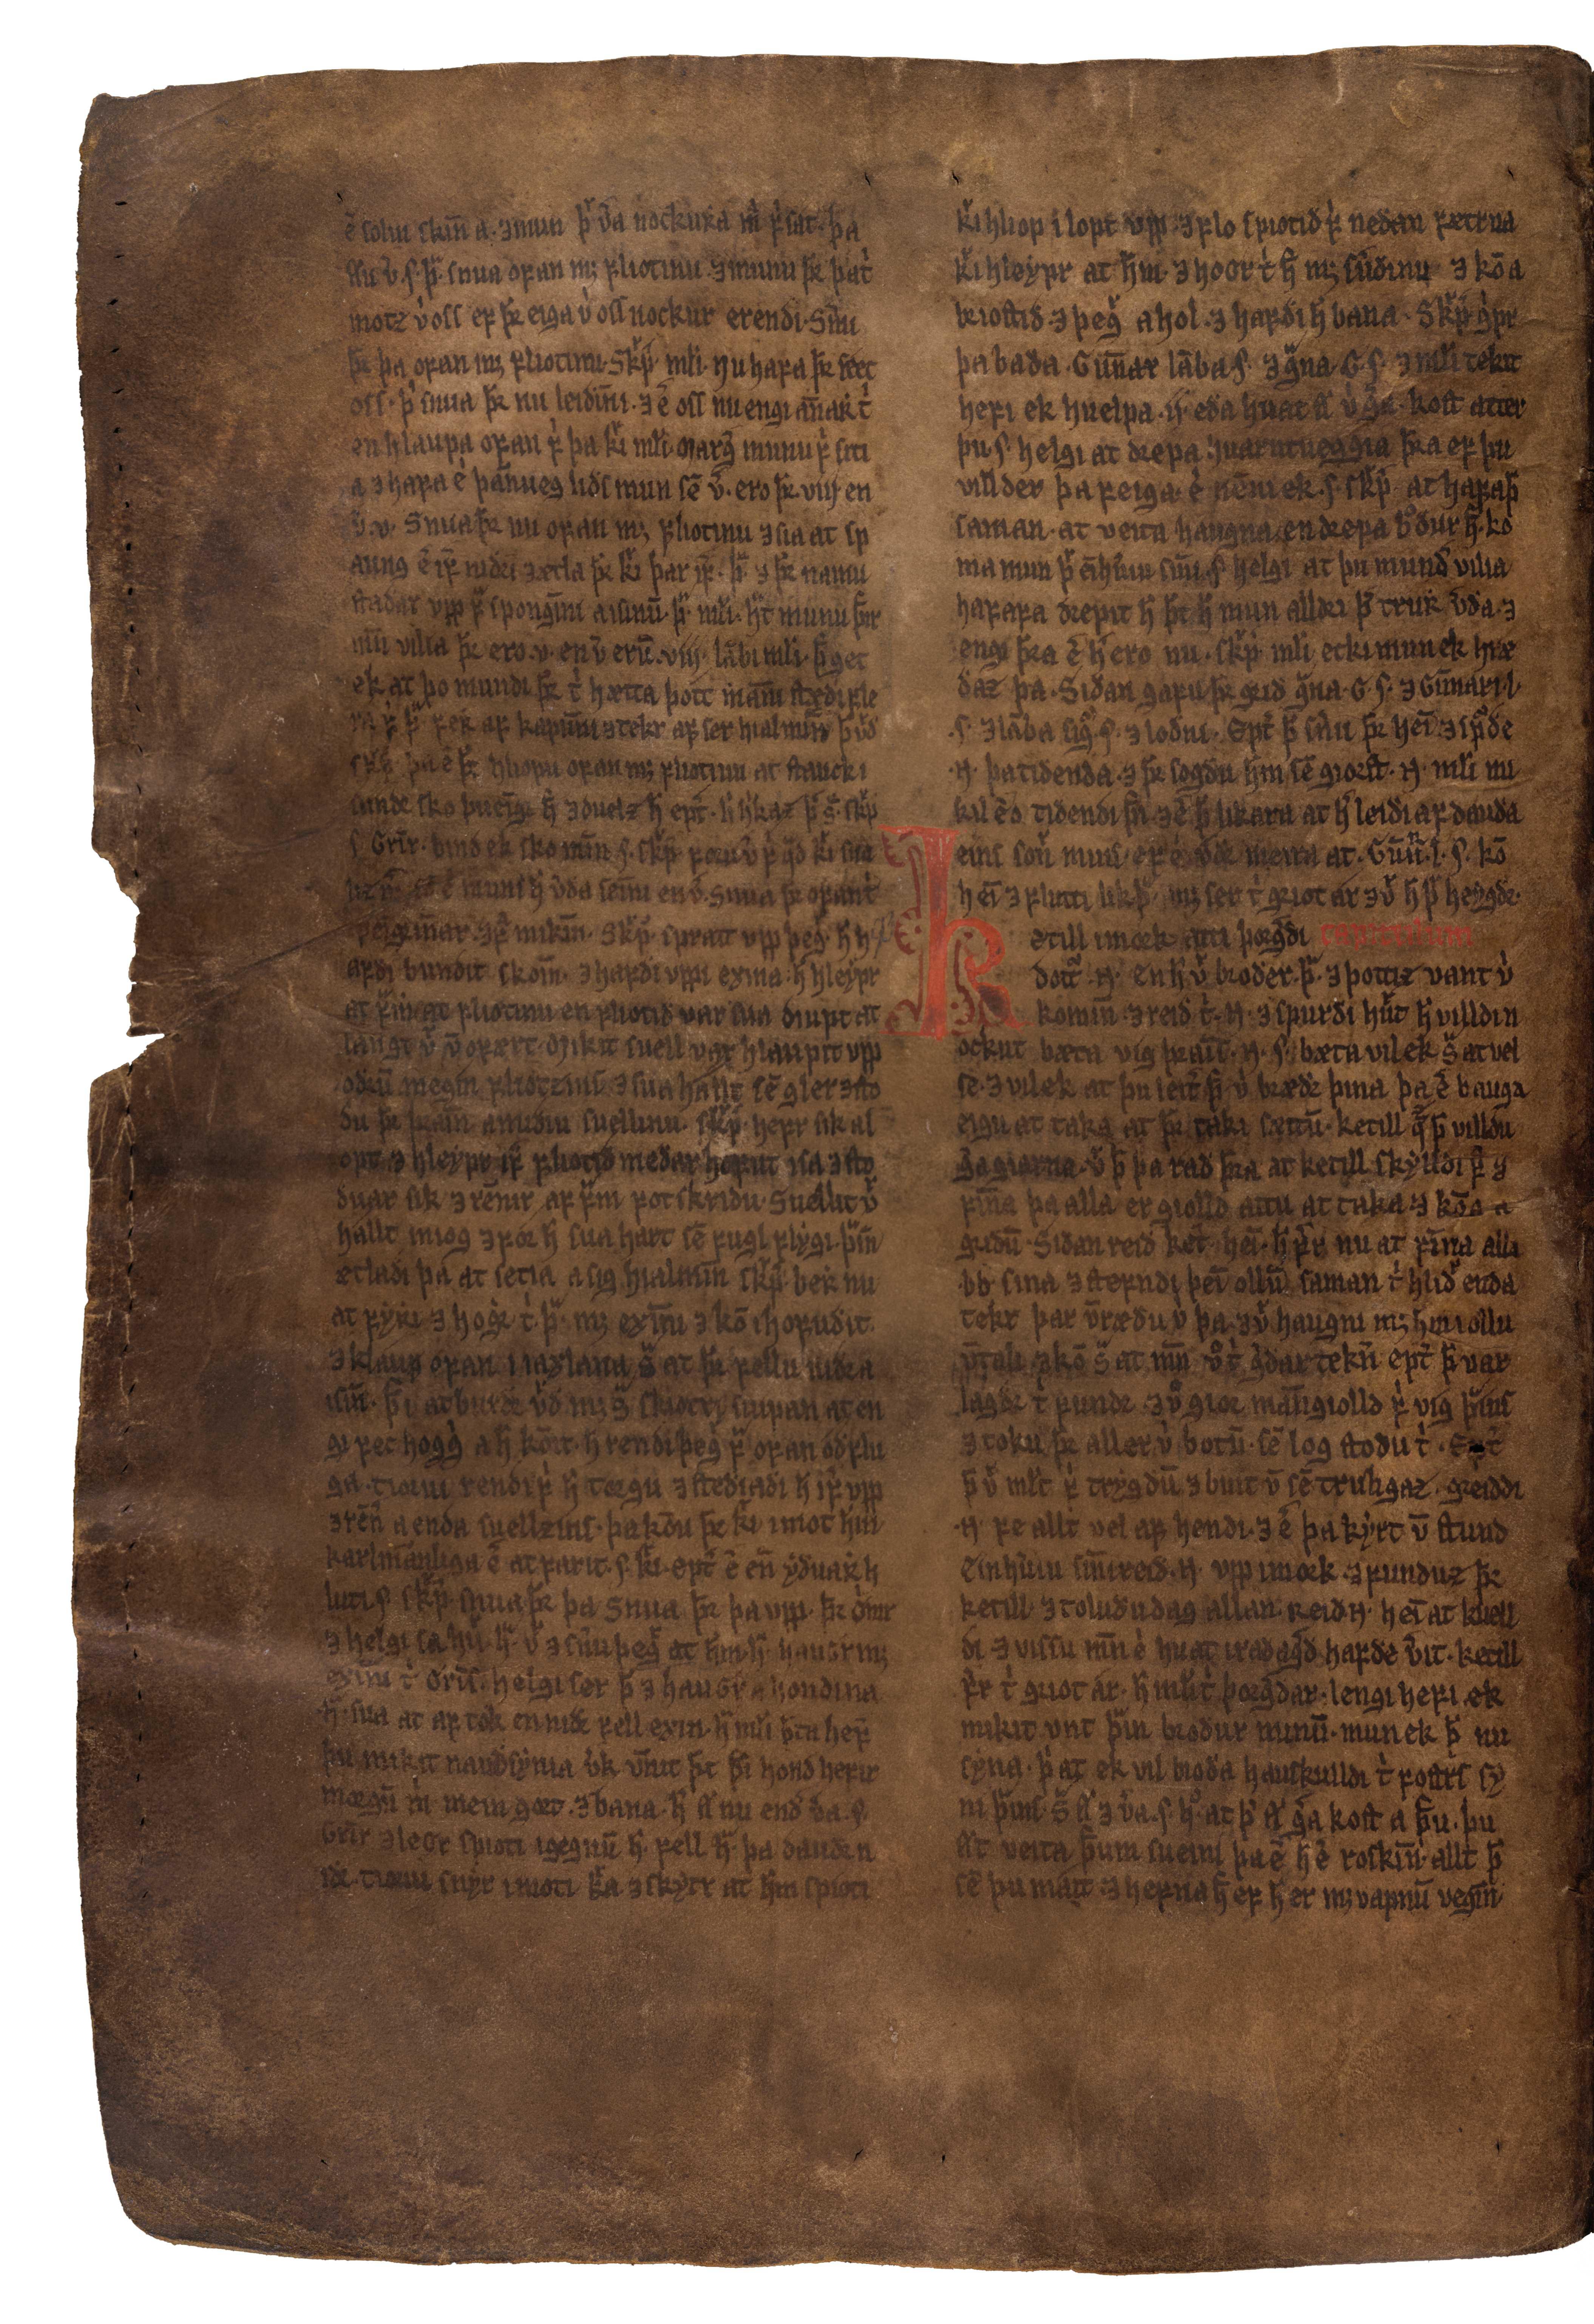 AM 132 fol - 34v